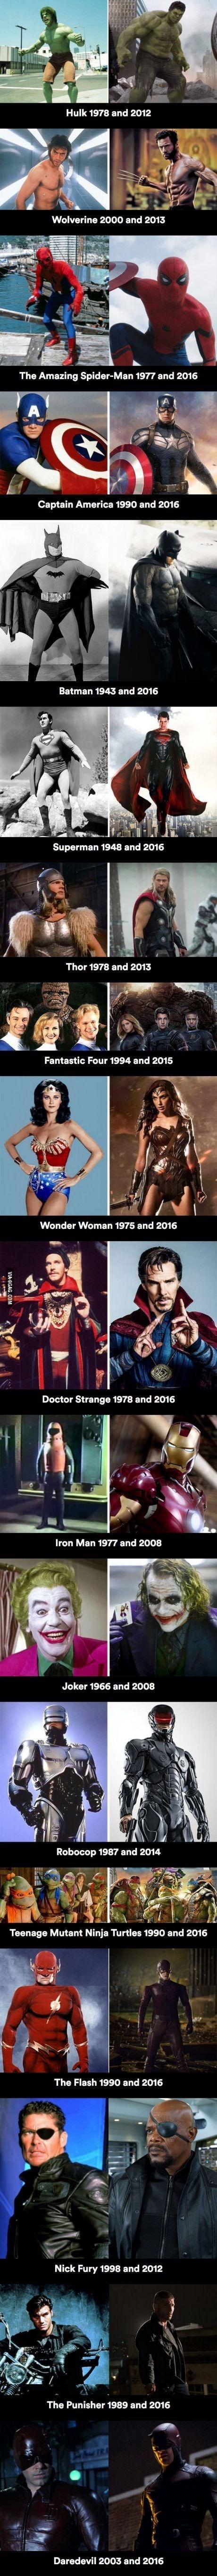 ridiculous-superhero-body-standards